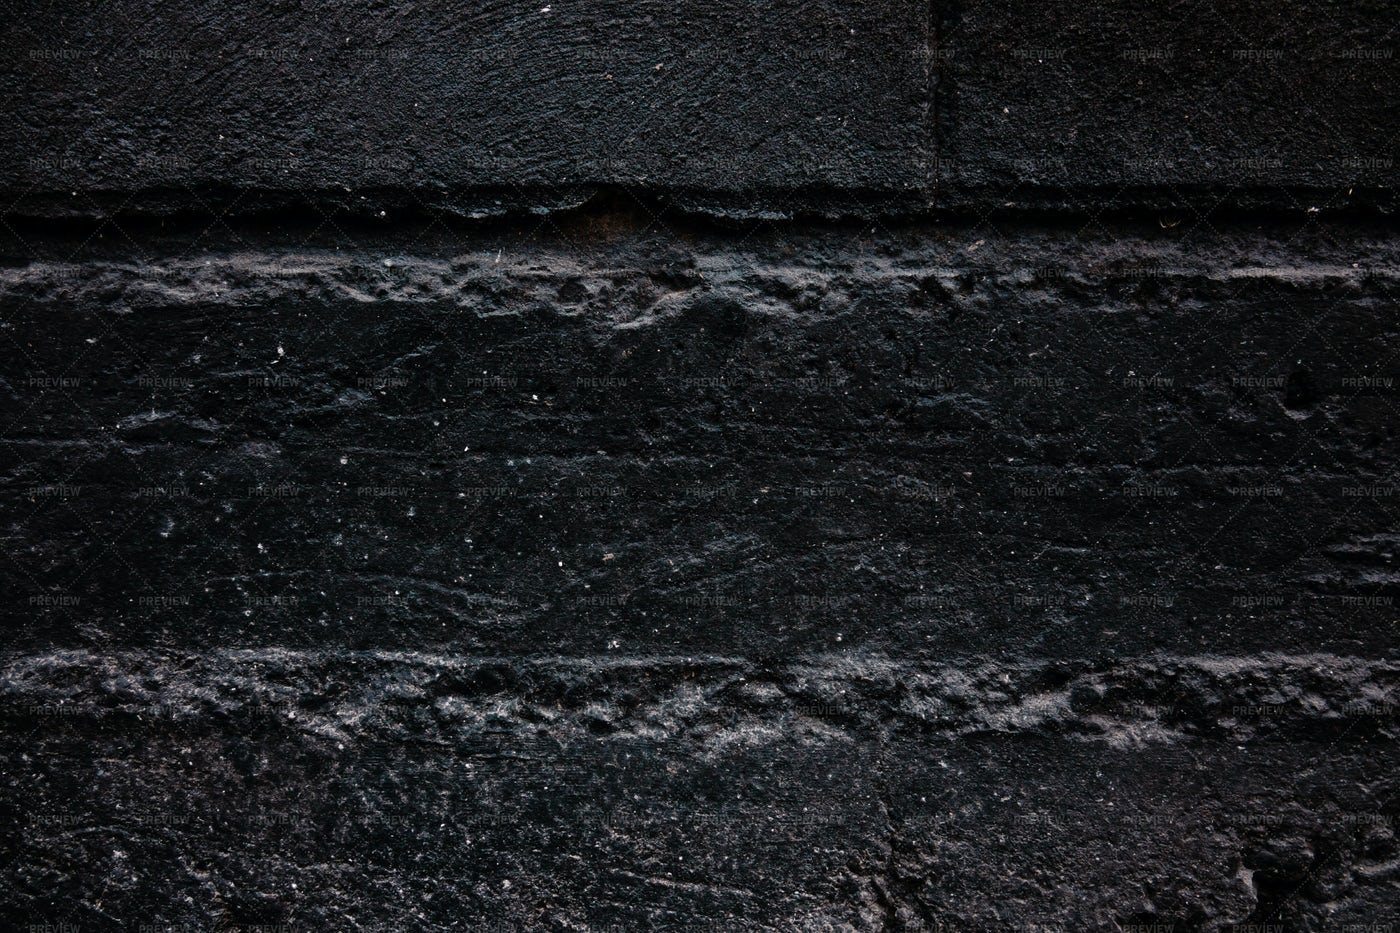 Texture Of Painted Black Concrete: Stock Photos